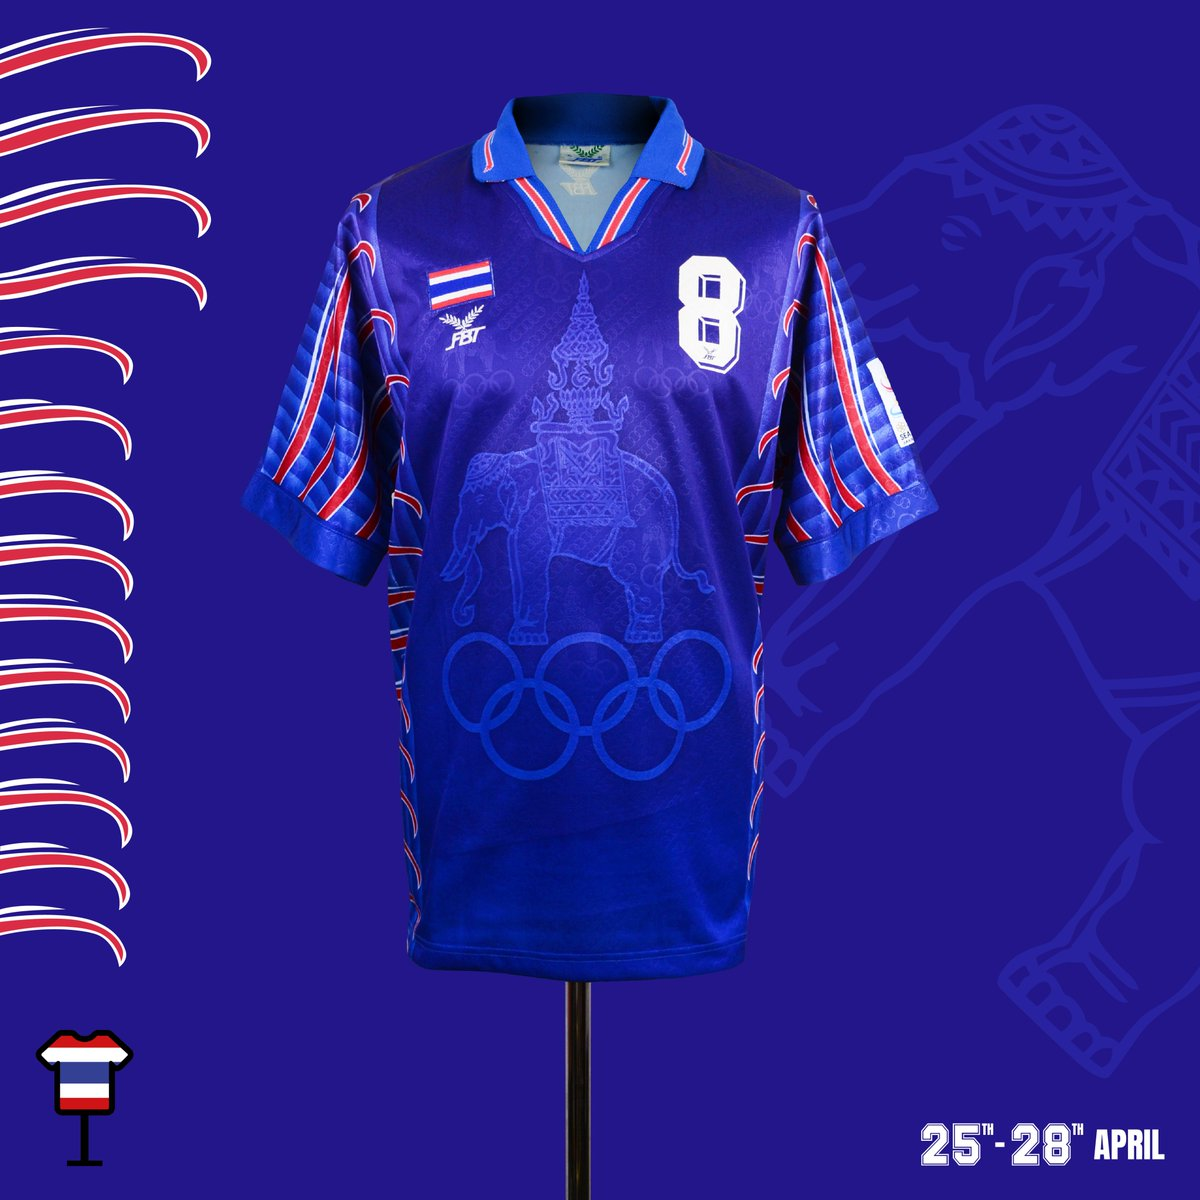 43a788ea4 Classic Football Shirts on Twitter